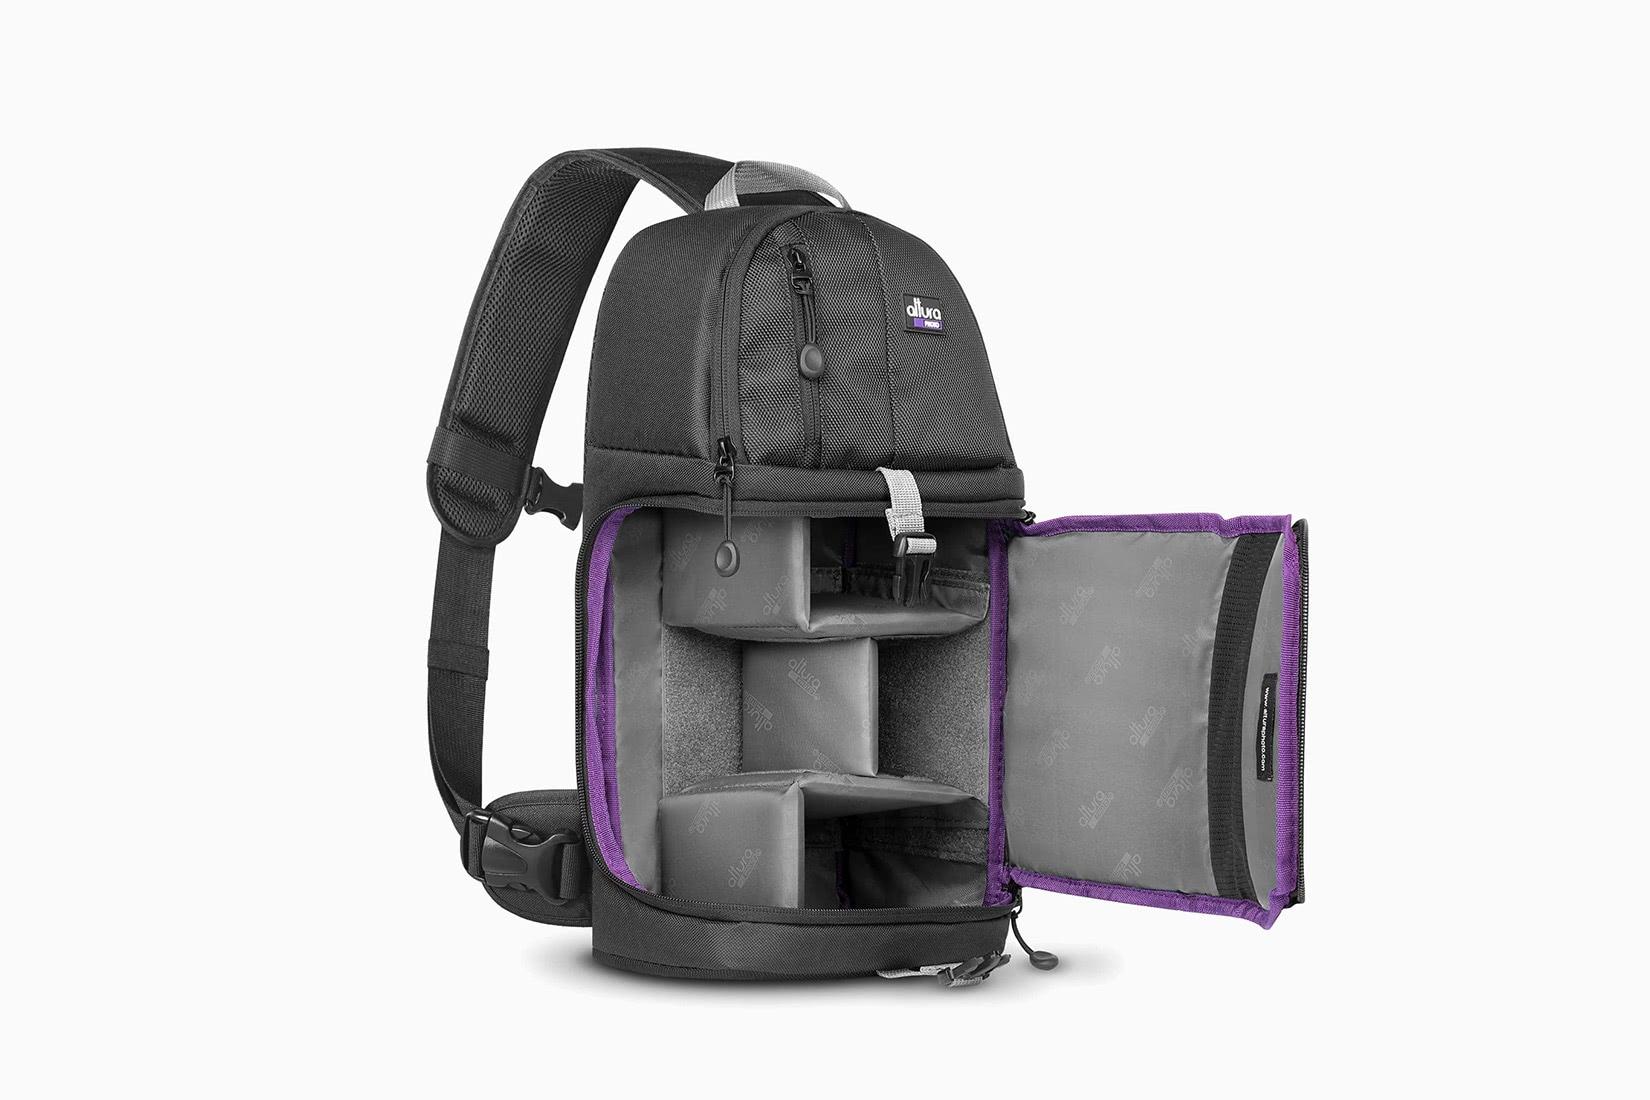 best camera backpacks altura sling - Luxe Digital